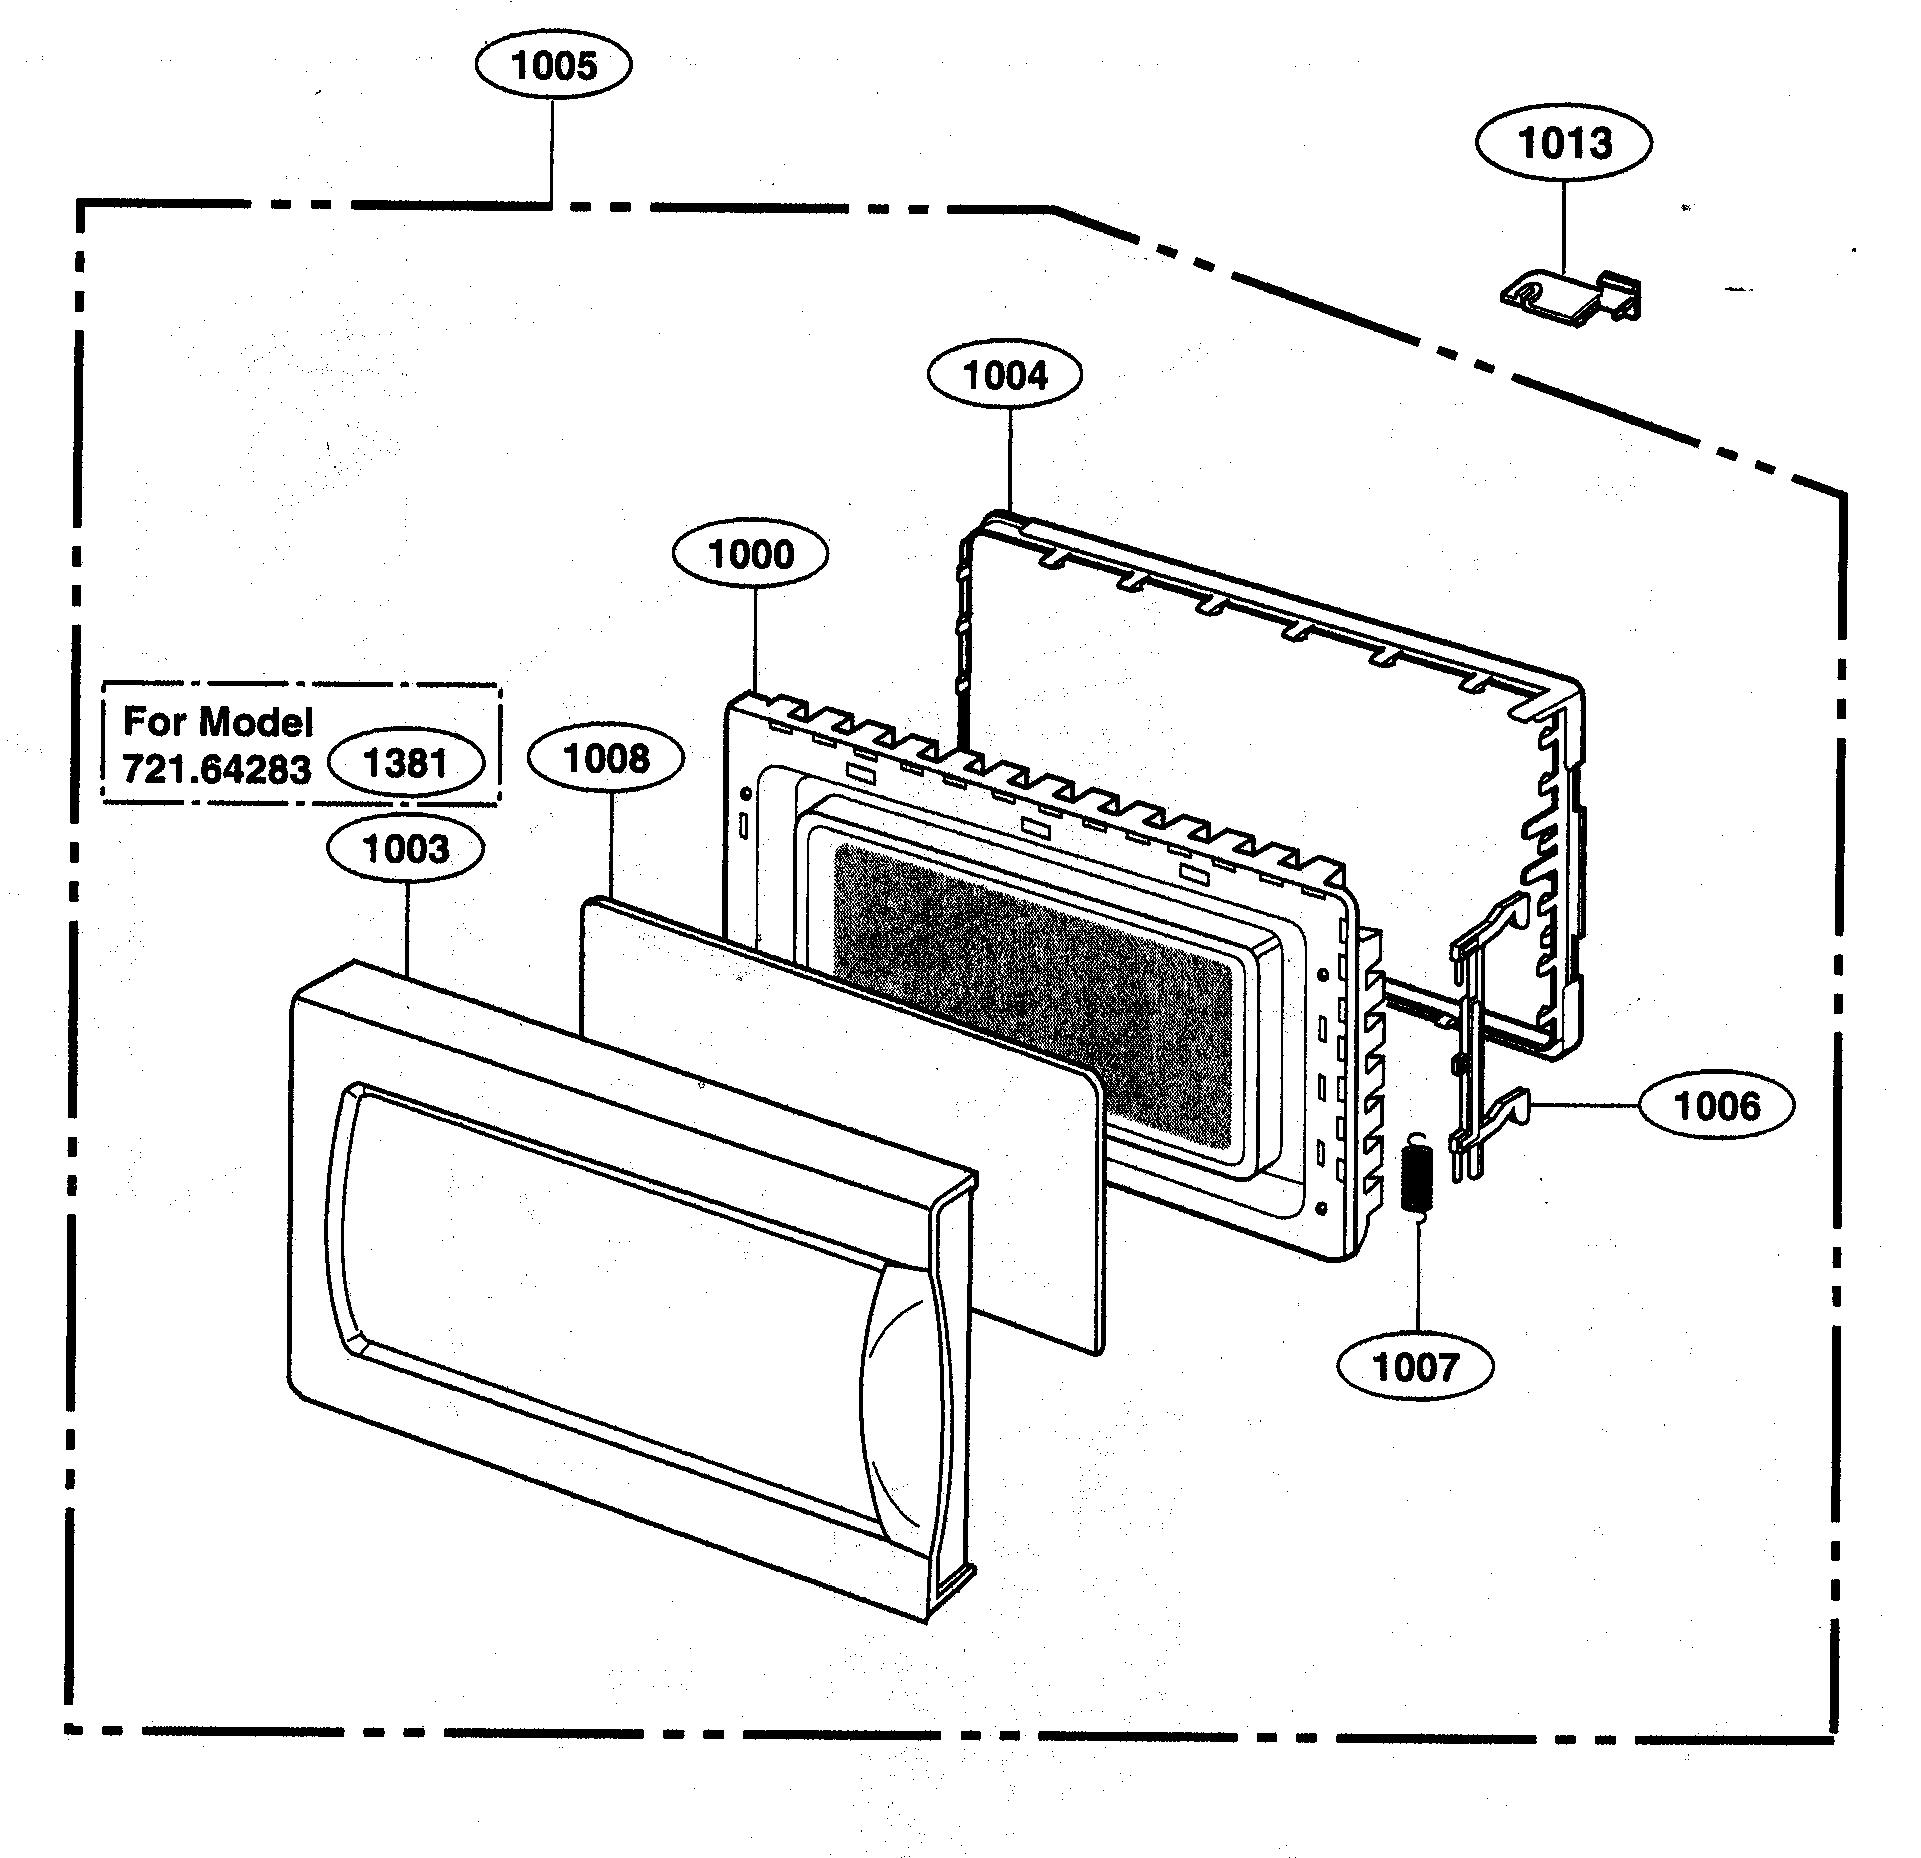 Kenmore-Elite model 72164289301 countertop microwave